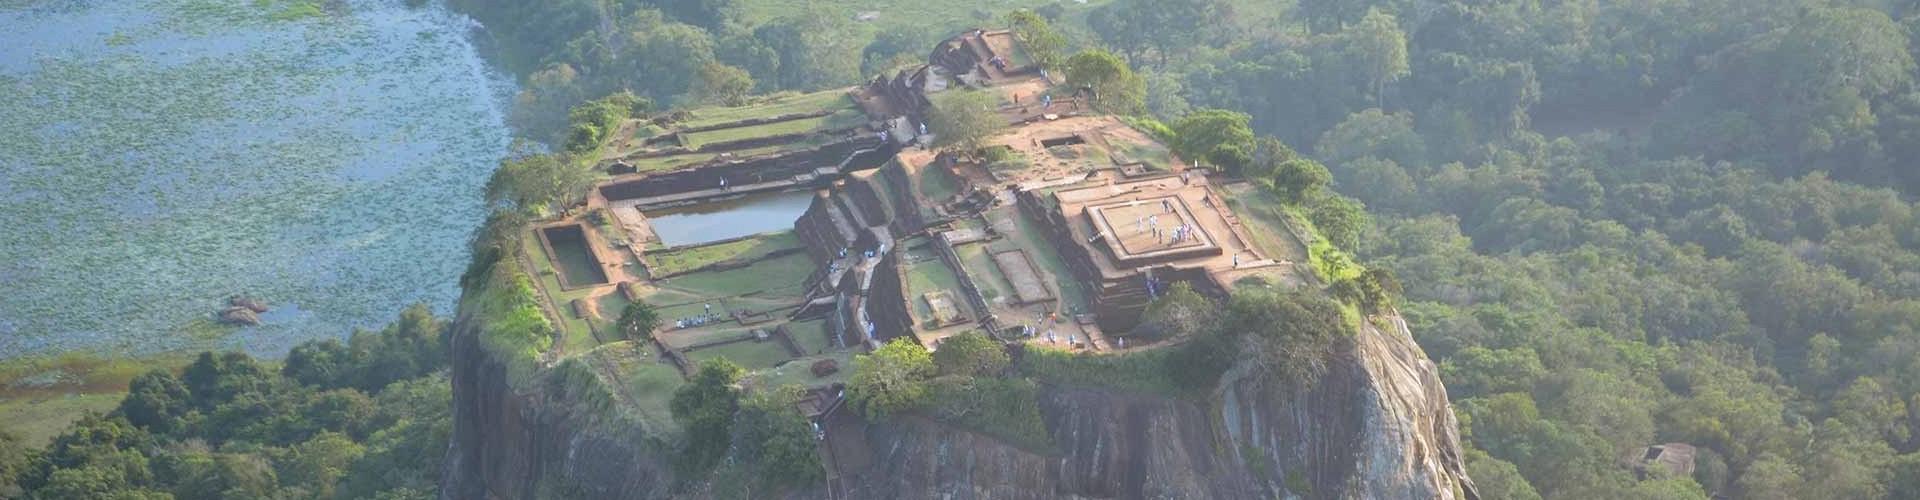 Aerial view of Sigiriya Rock Fortress